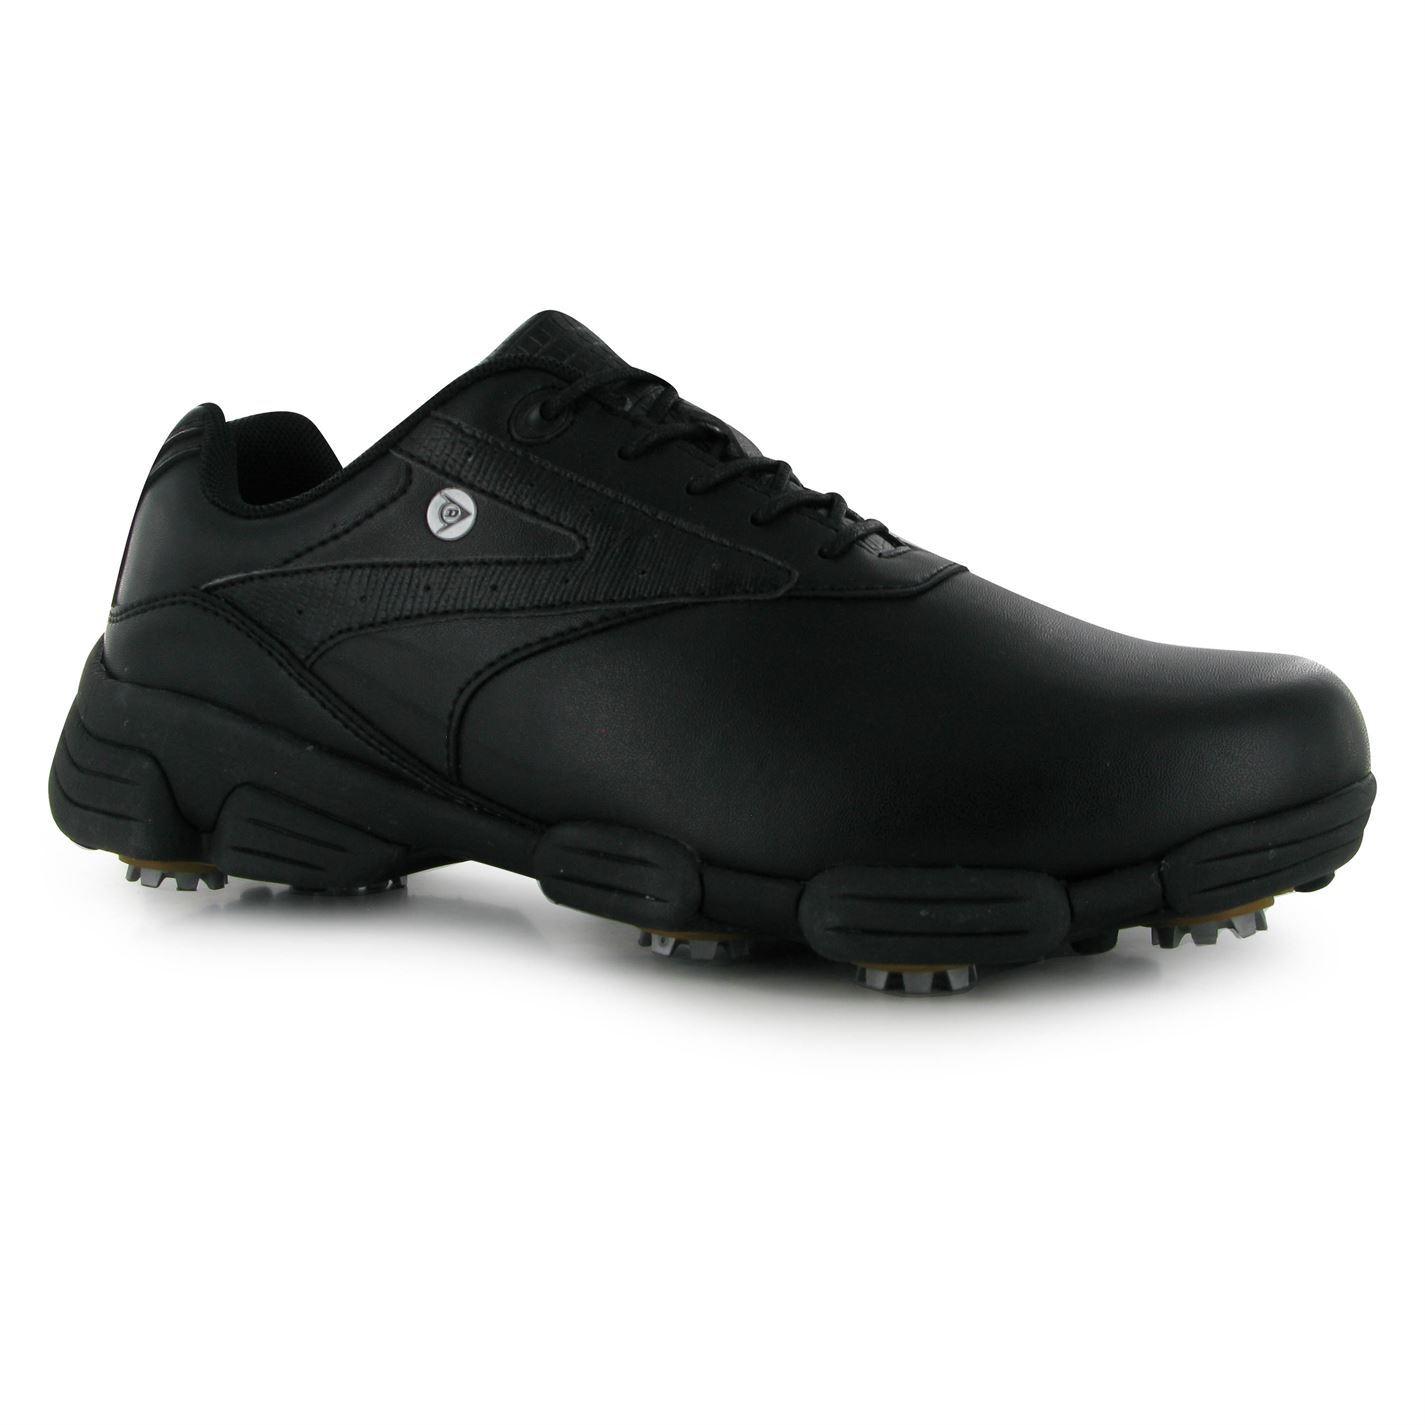 dunlop biomimetic 100 golf shoes mens black golfing